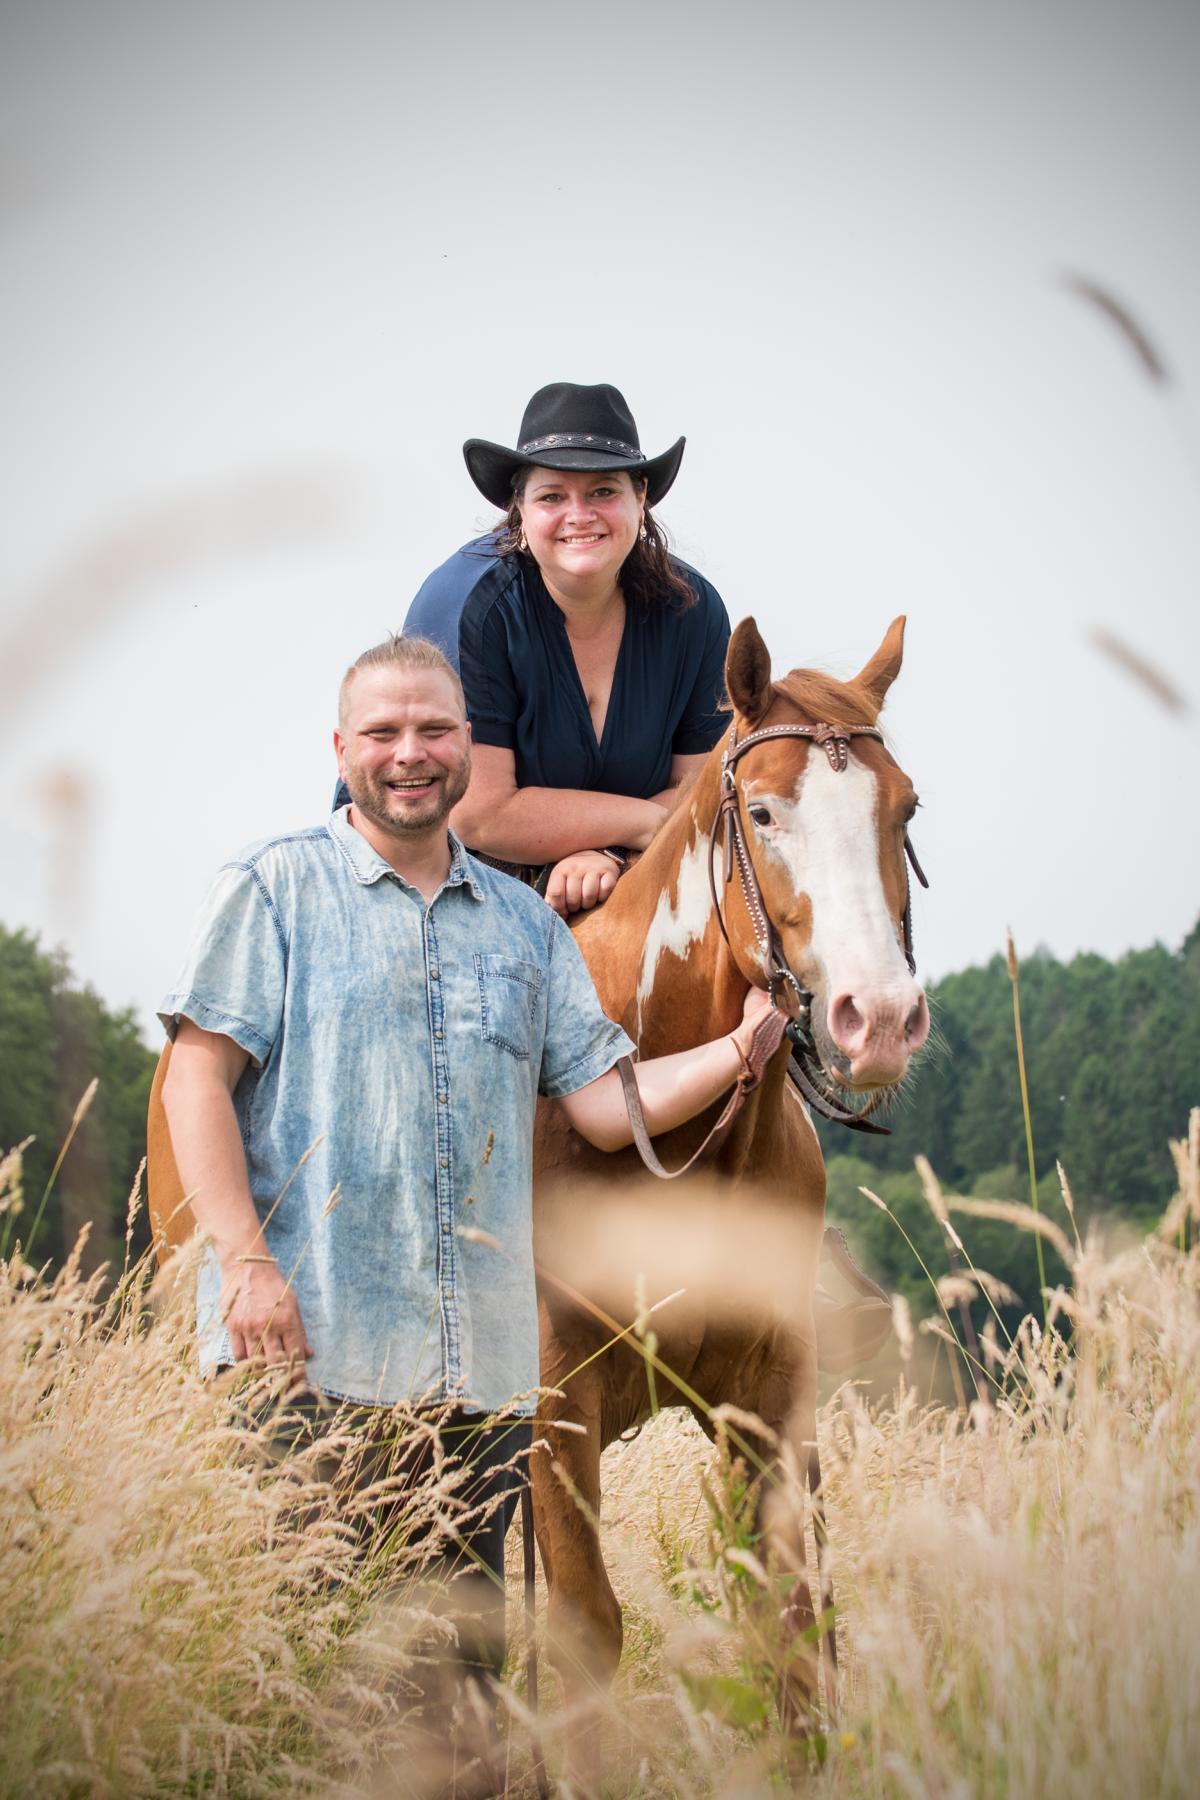 Cowgirl Cowboy Quarter Horse Sonny Fotos